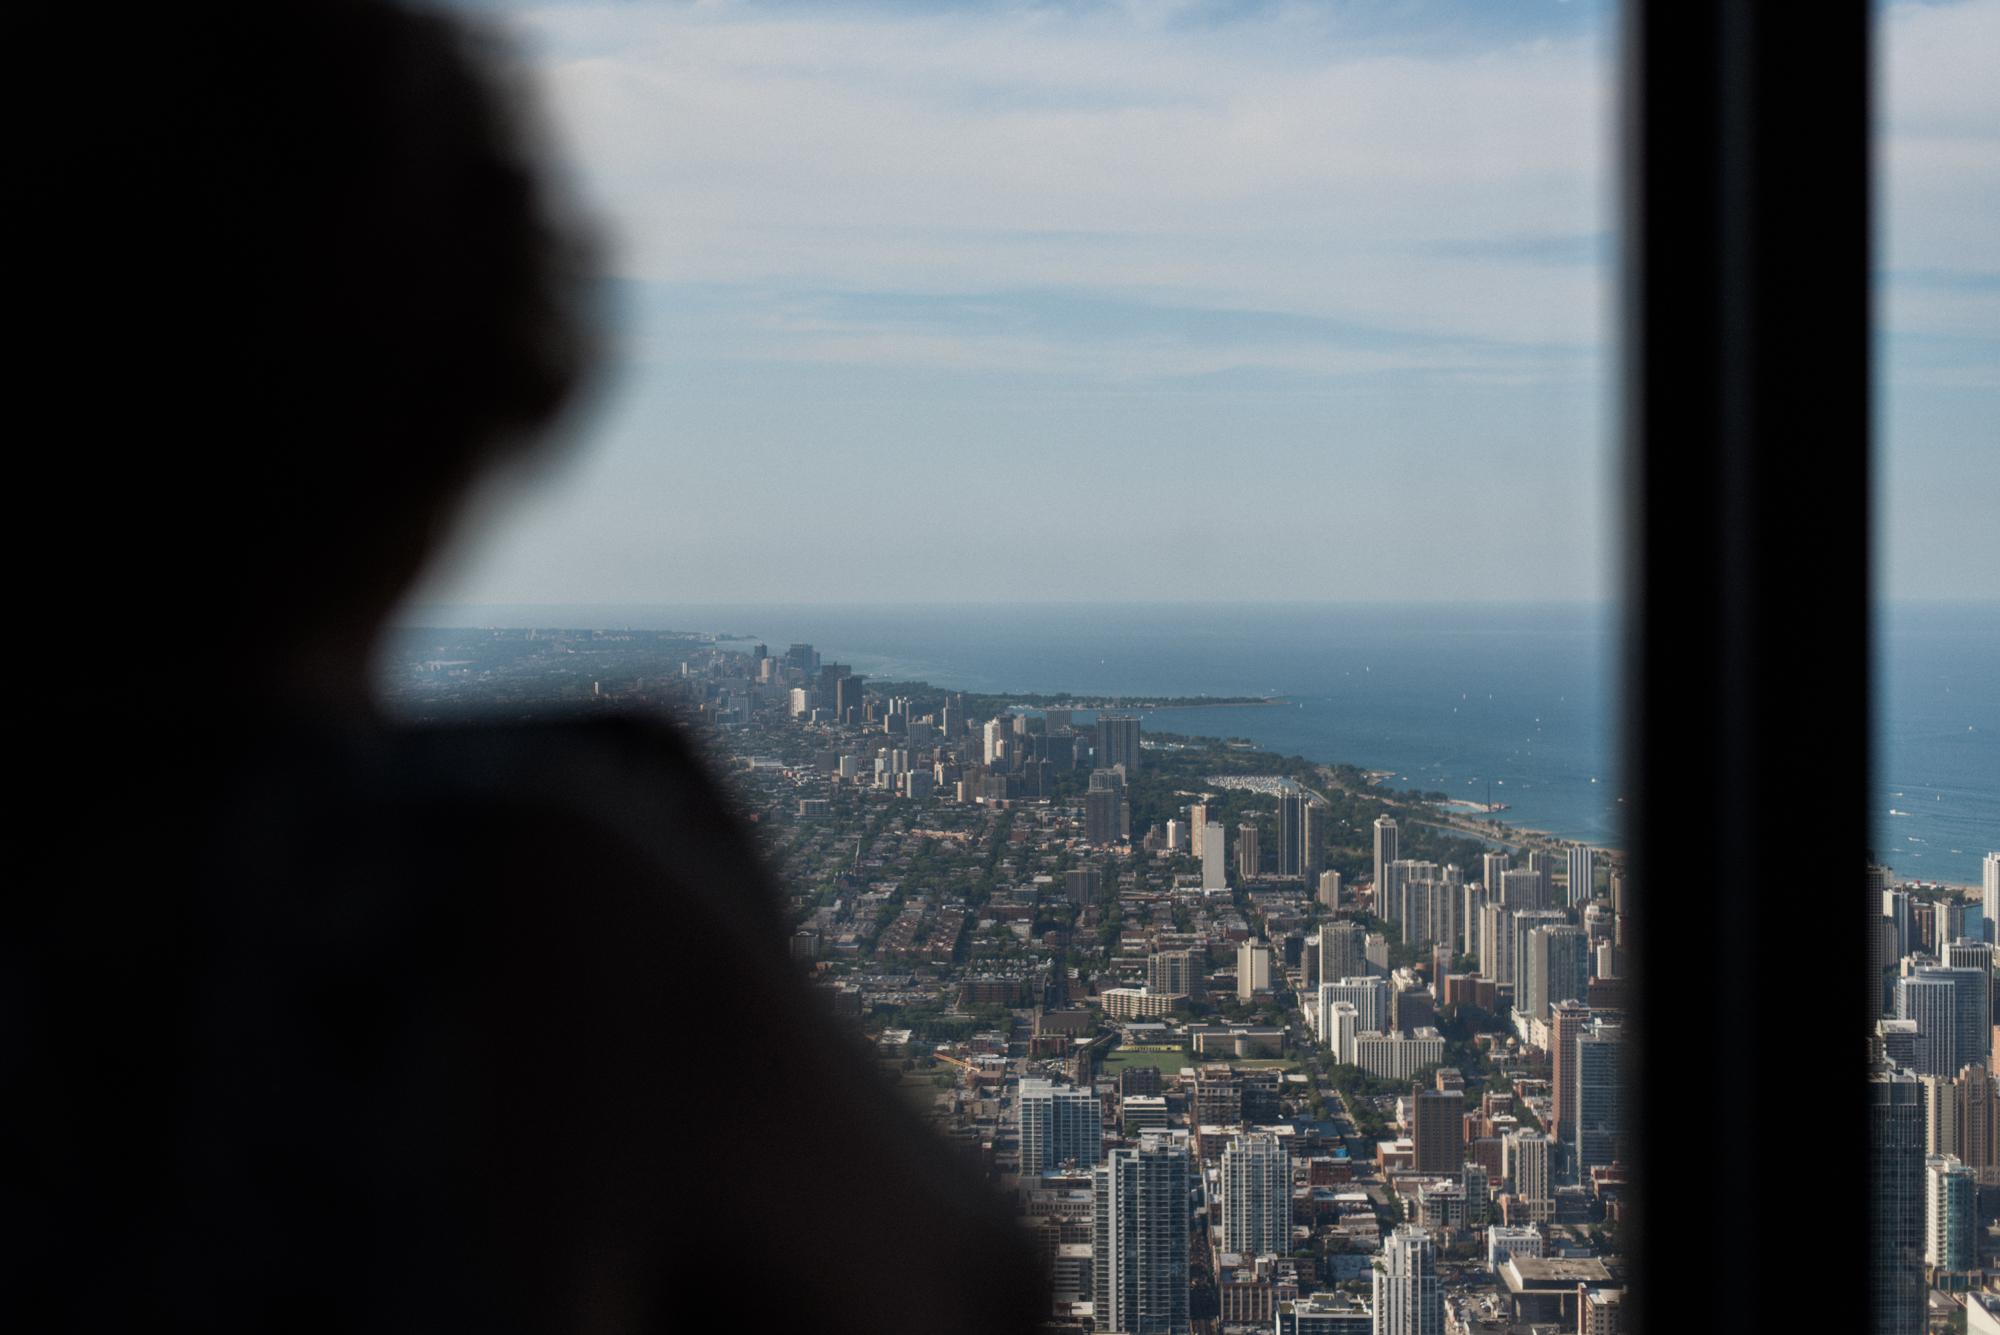 Chelsea Bliefernicht | Skydeck | Chicago Photographer